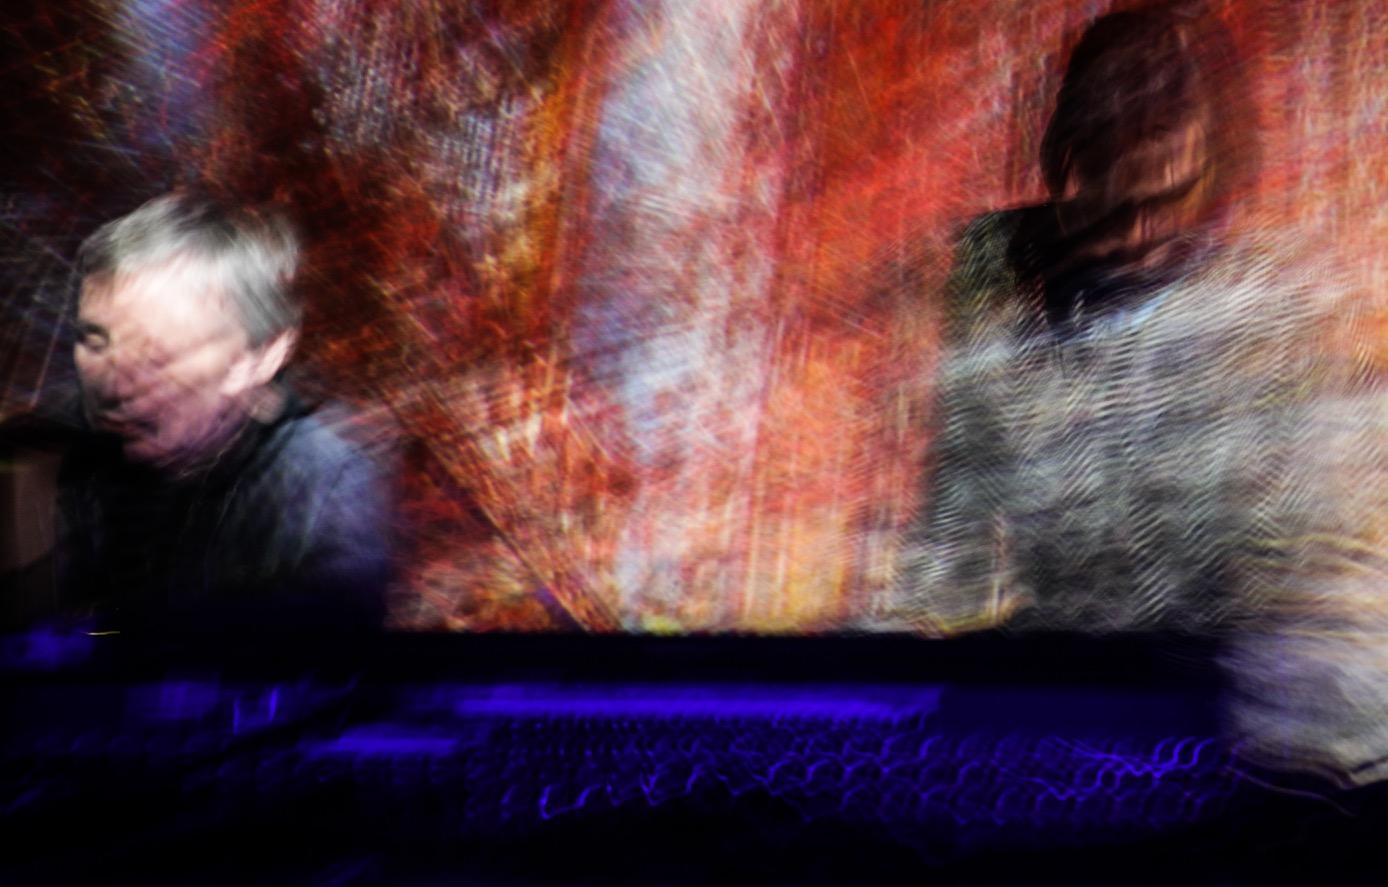 Ricardo-Villalobobos.-Max-Loderbauer.-Live-Mutek-Barcelona-2016.-Vilod-2.jpg